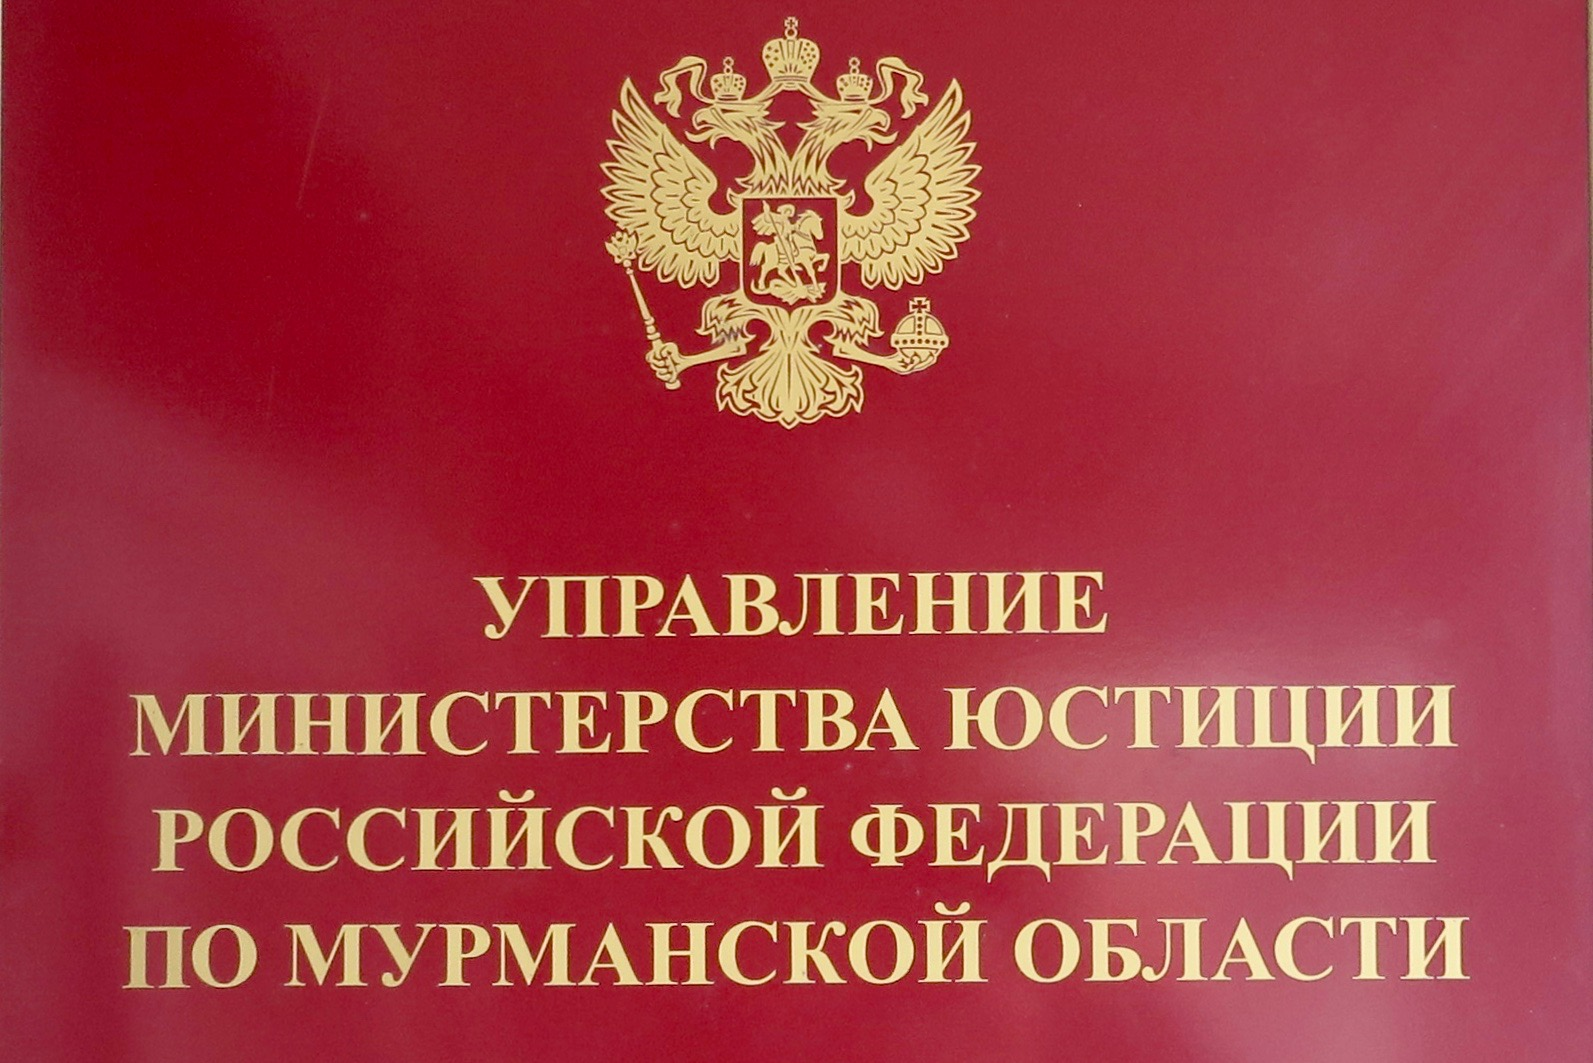 Министерство юстиции ссср